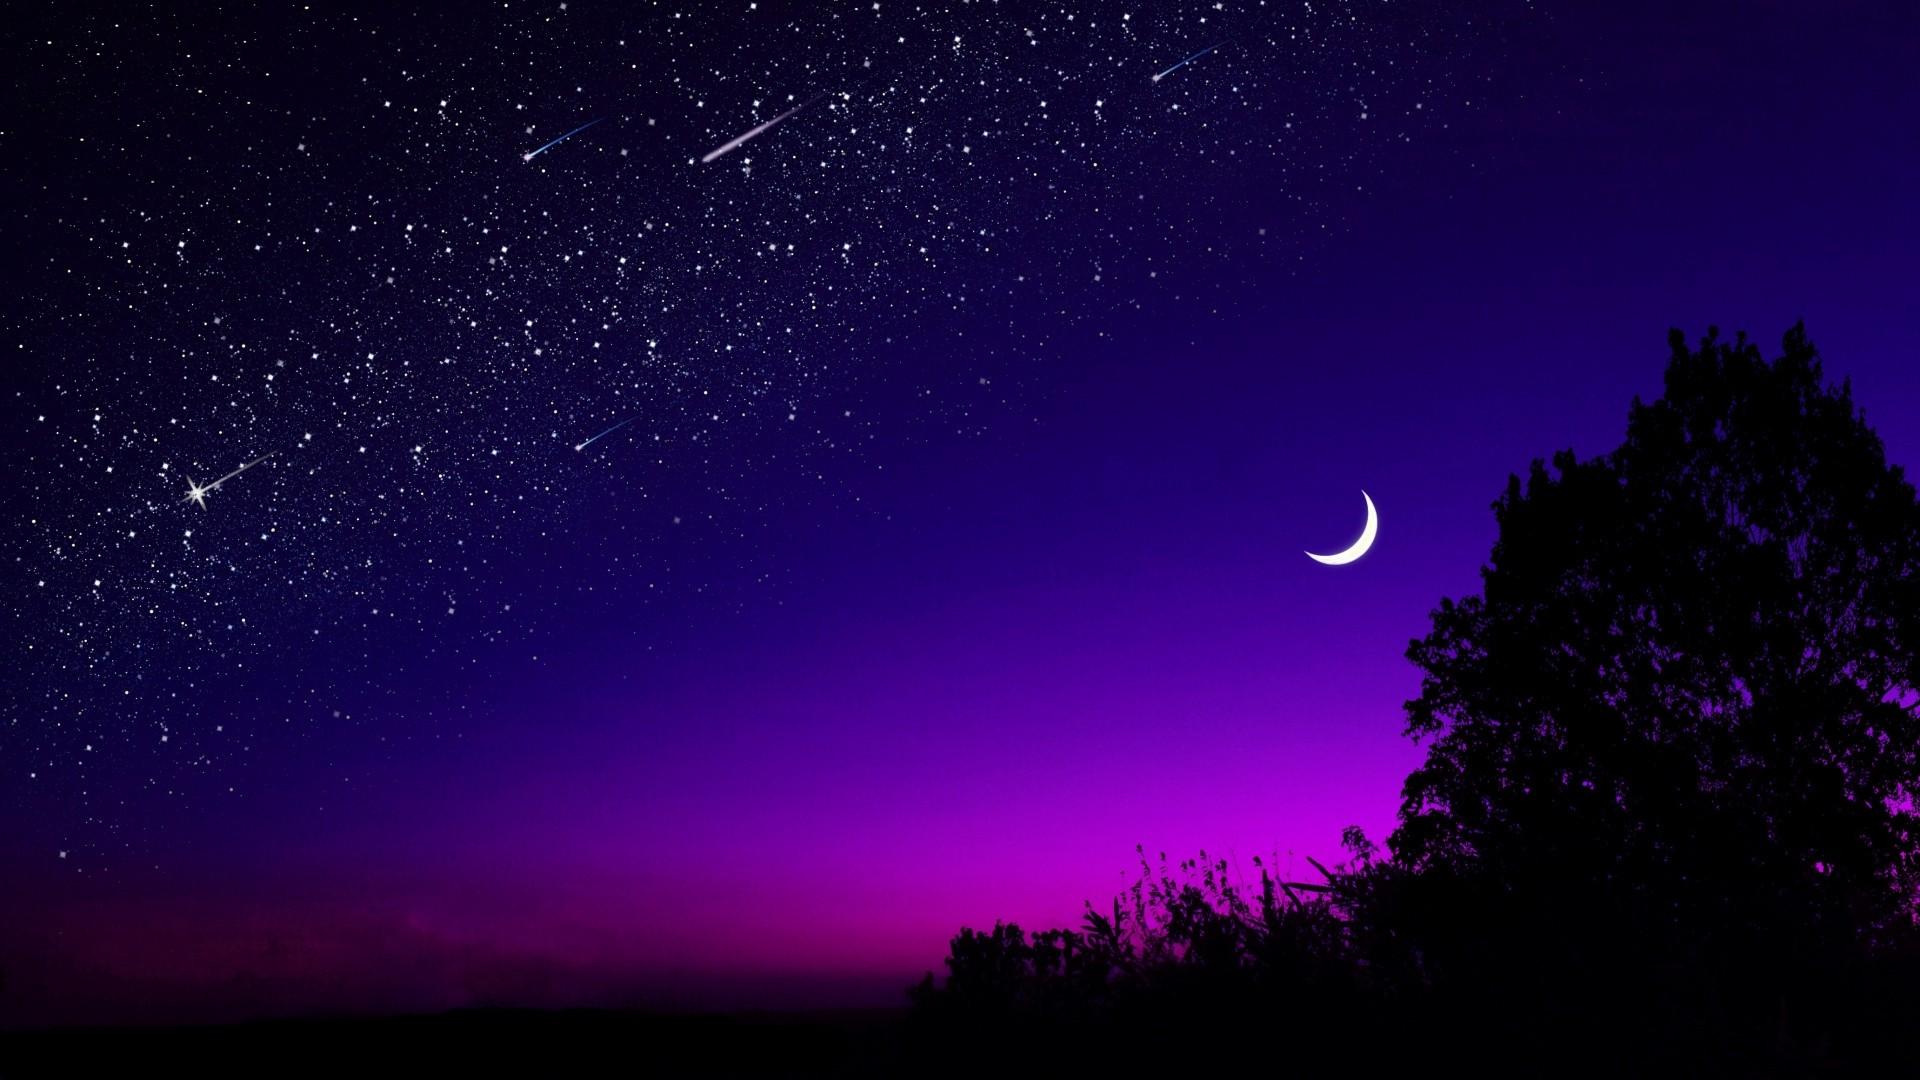 Moon And Stars Wallpaper theme